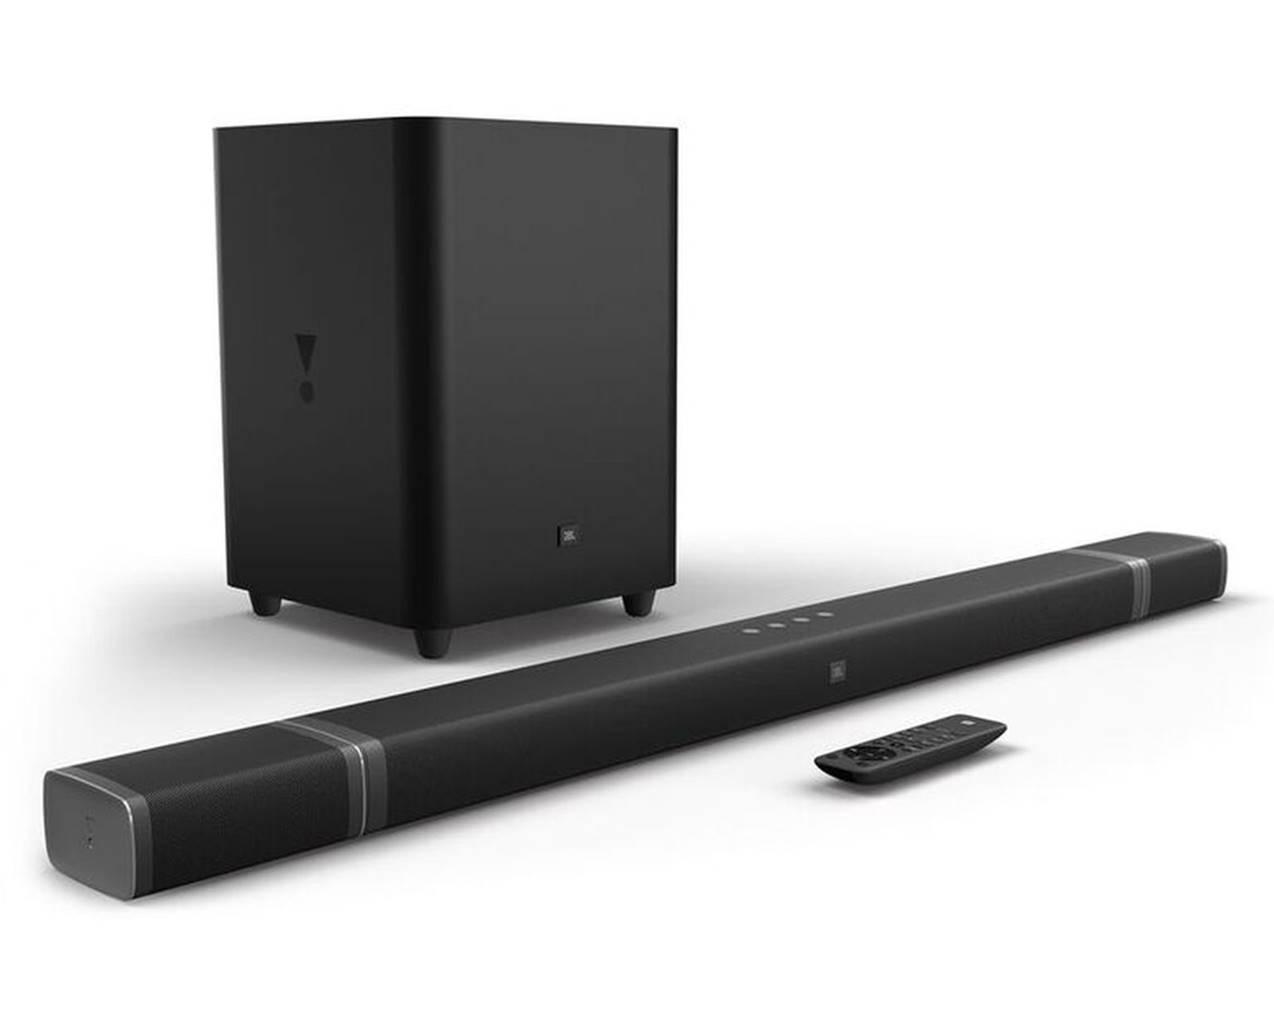 JBL Bar 5.1 Wireless Surround Sound System